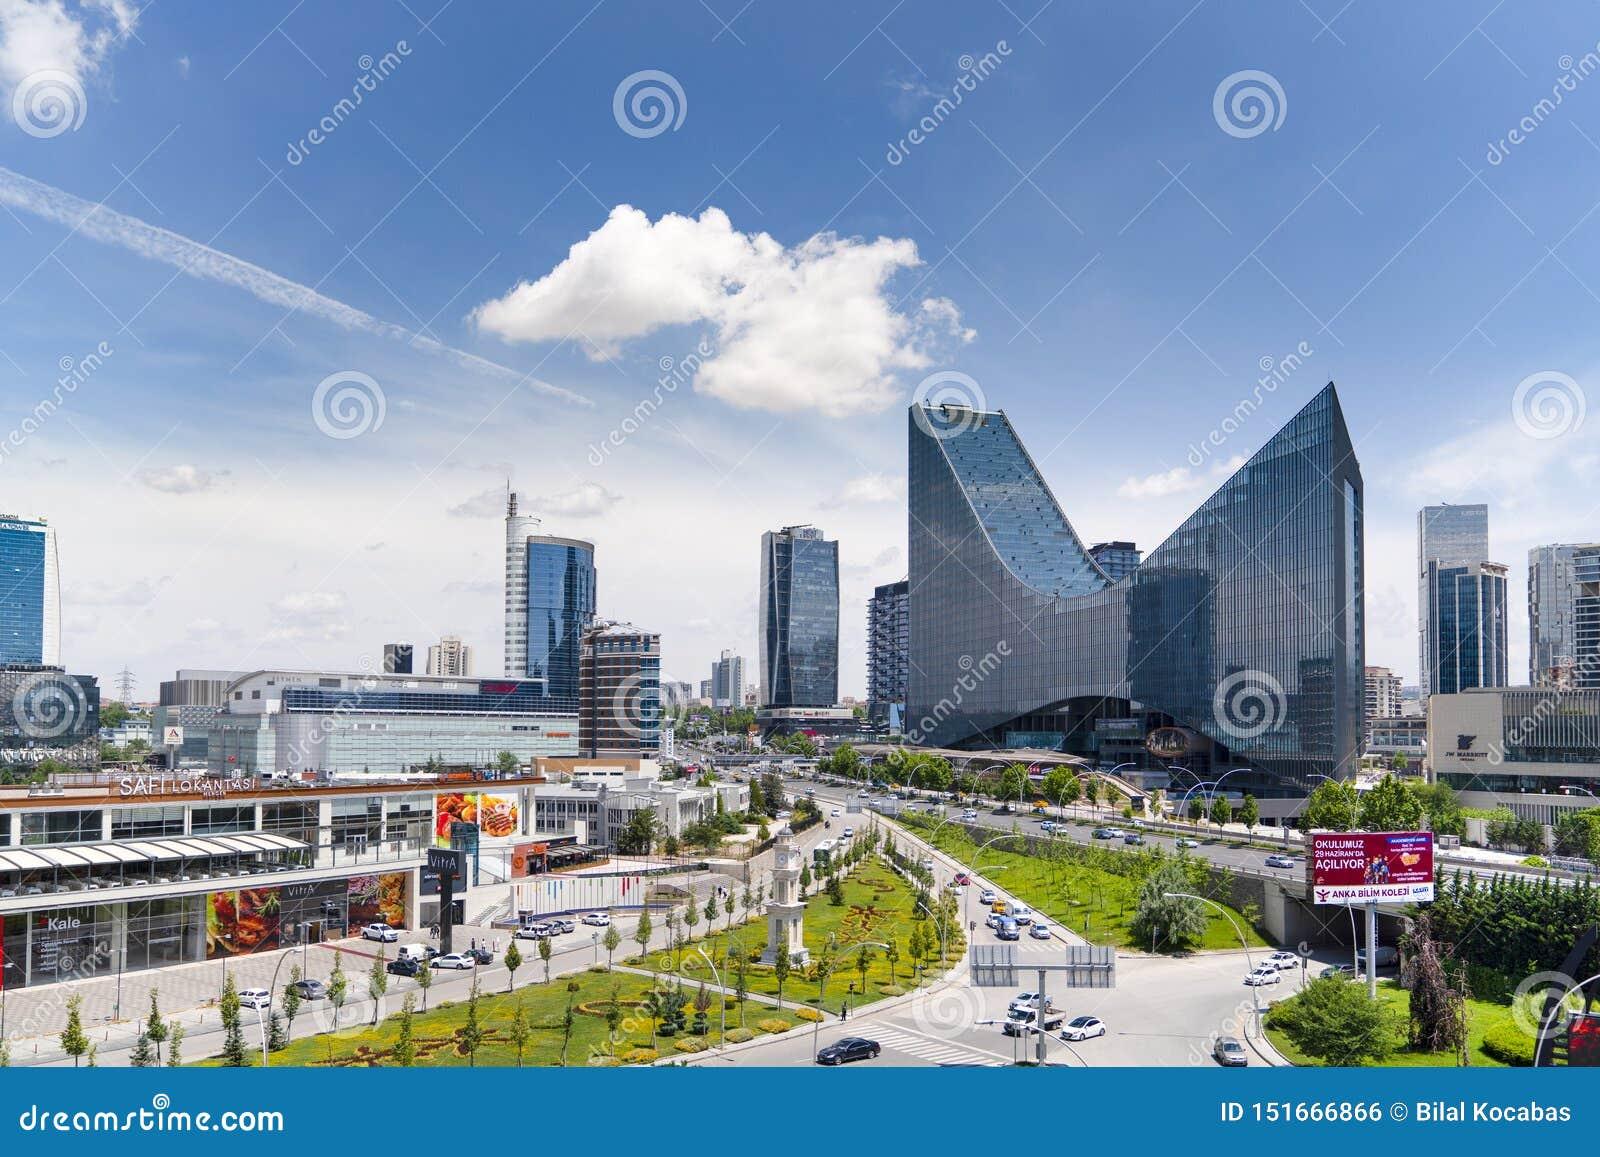 Анкара/Турция 23-ье июня 2019: Панорамный взгляд Анкара с районом Sogutozu